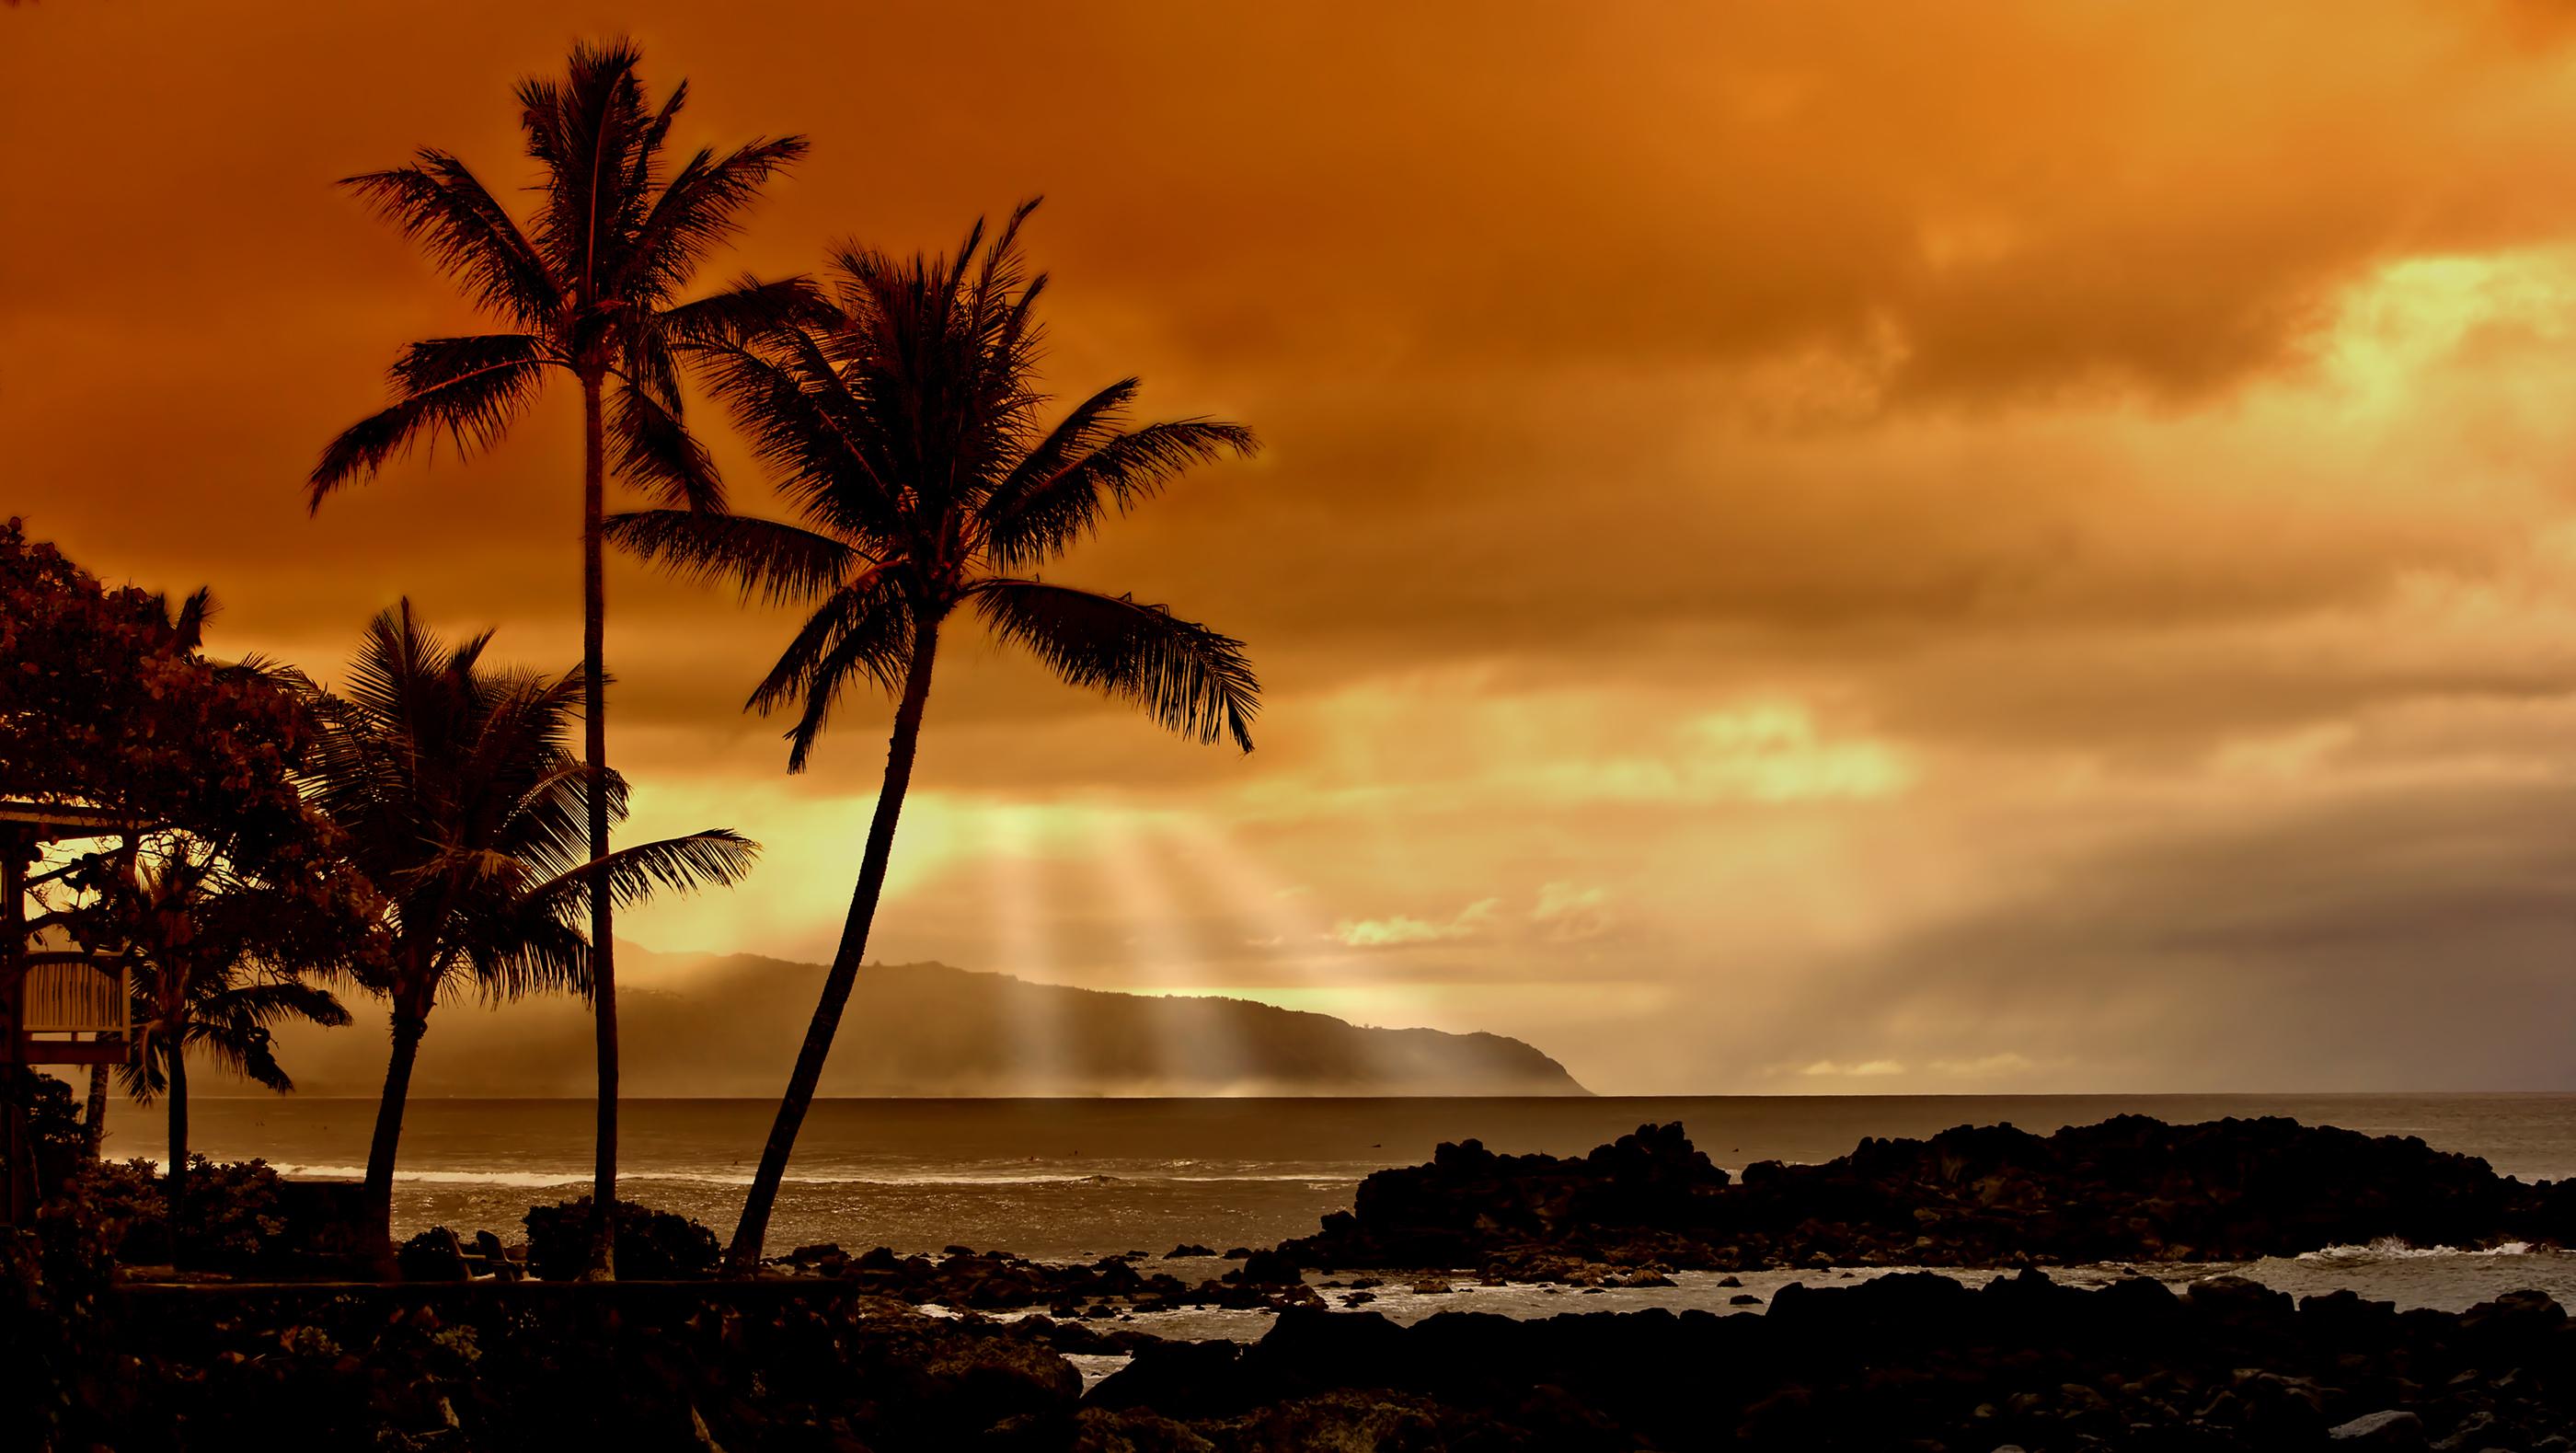 tropical sunset palm tree - photo #6